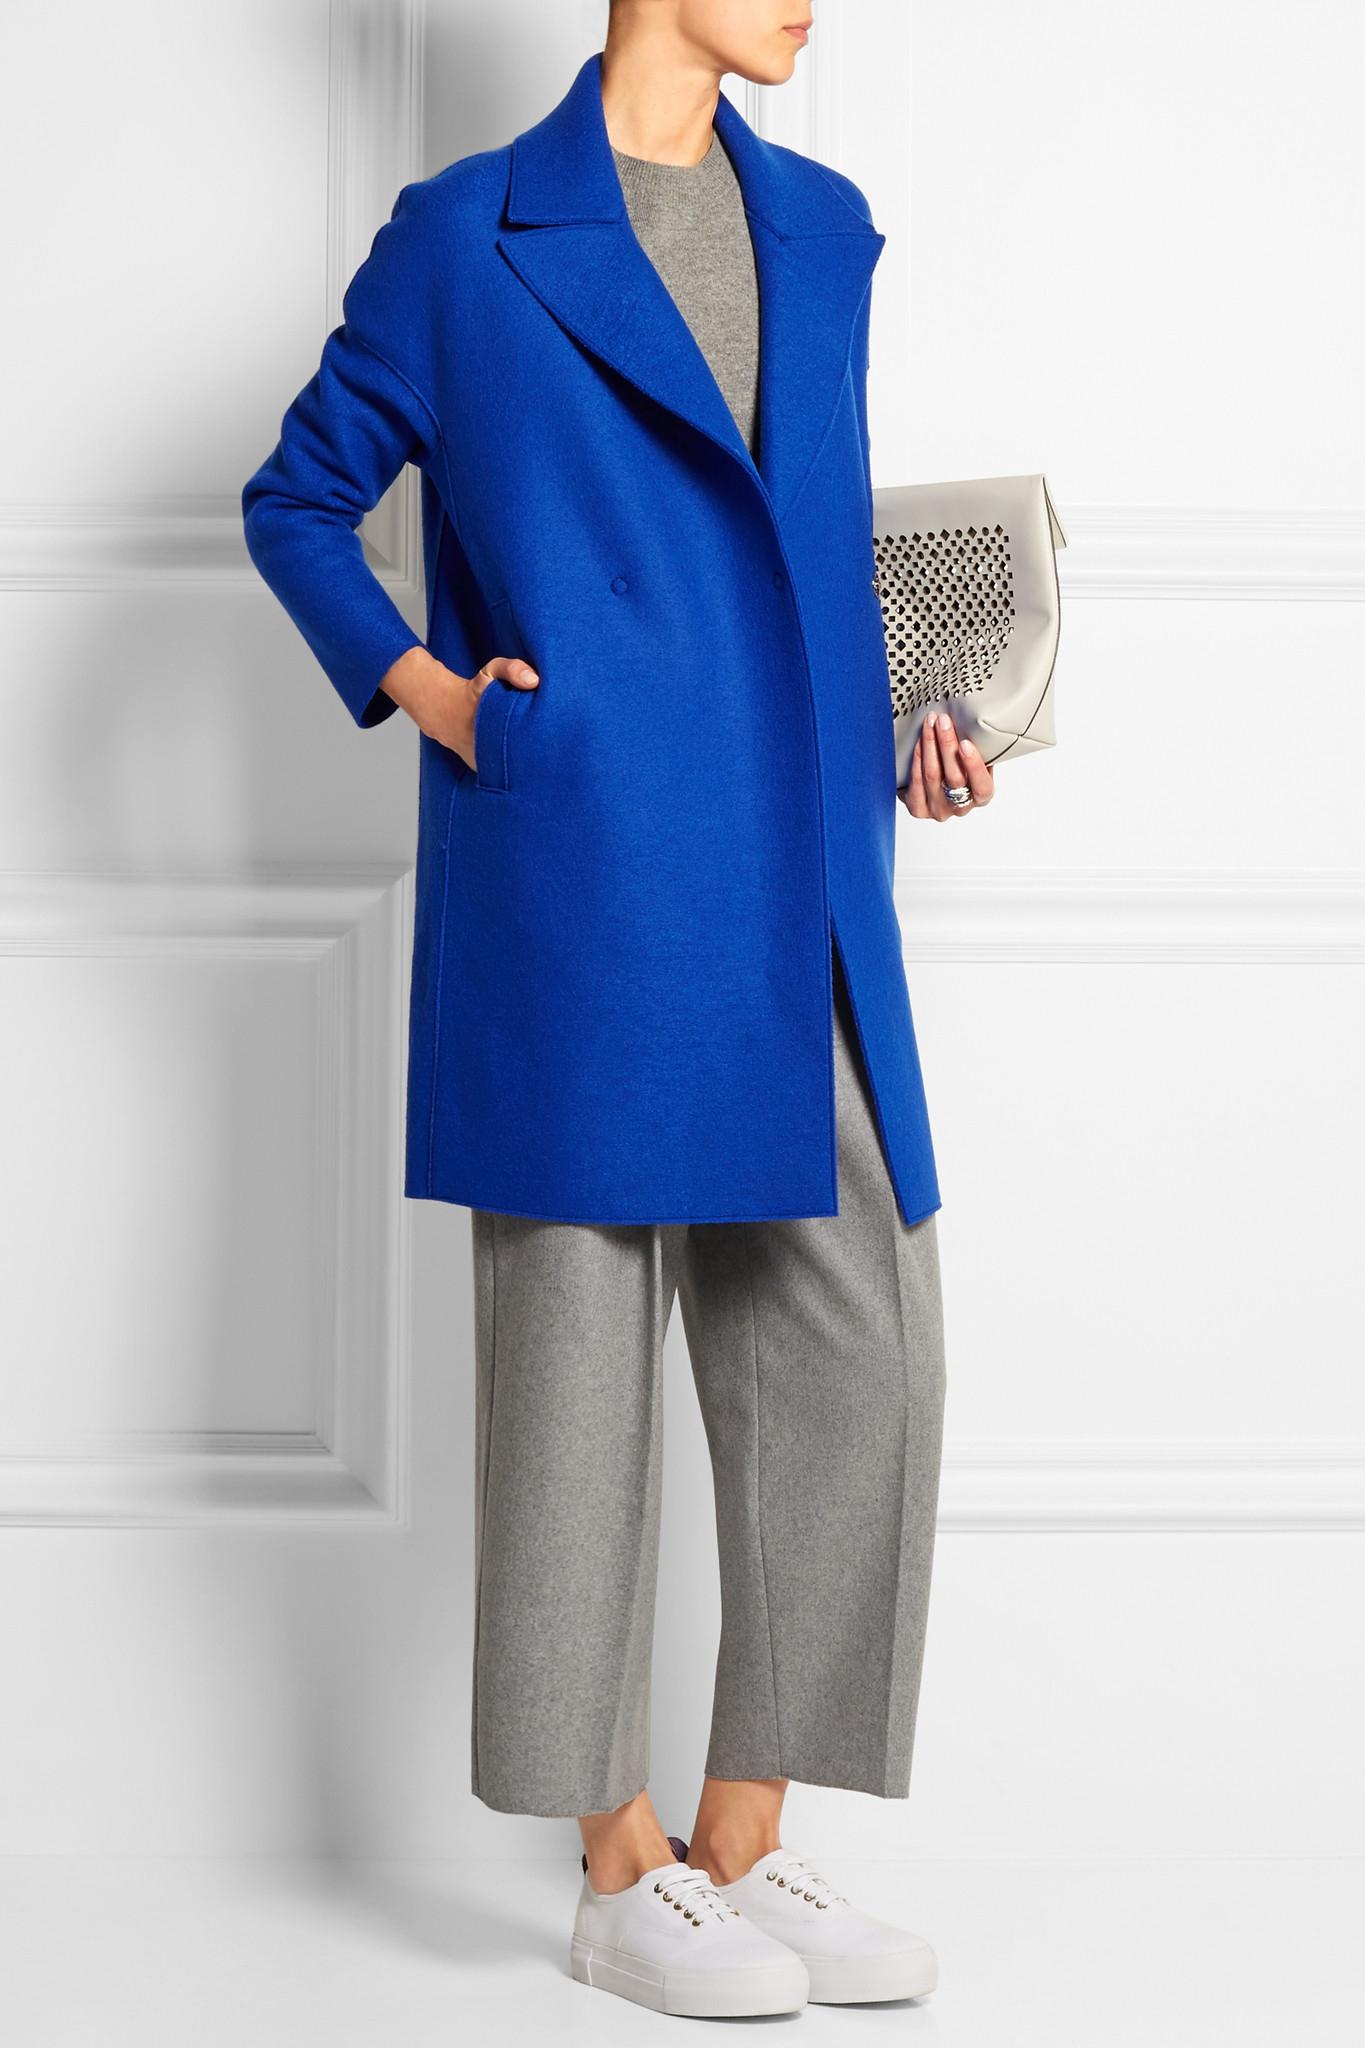 lyst harris wharf london wool felt coat in blue. Black Bedroom Furniture Sets. Home Design Ideas